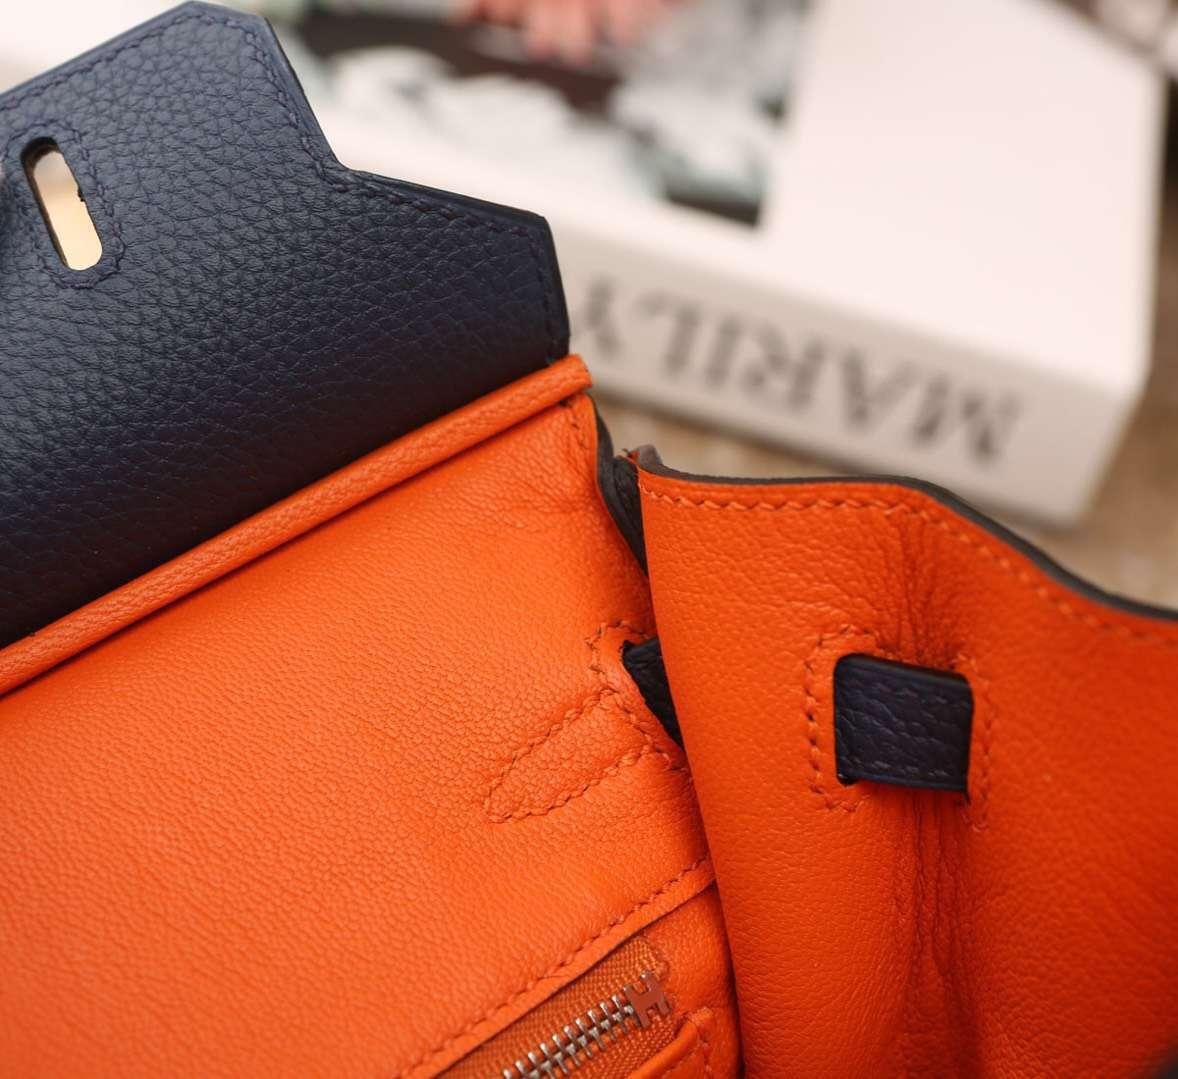 Hermes爱马仕 Birkin 25 7K 宝石蓝内拼橙色 原厂御用顶级小牛皮 银扣